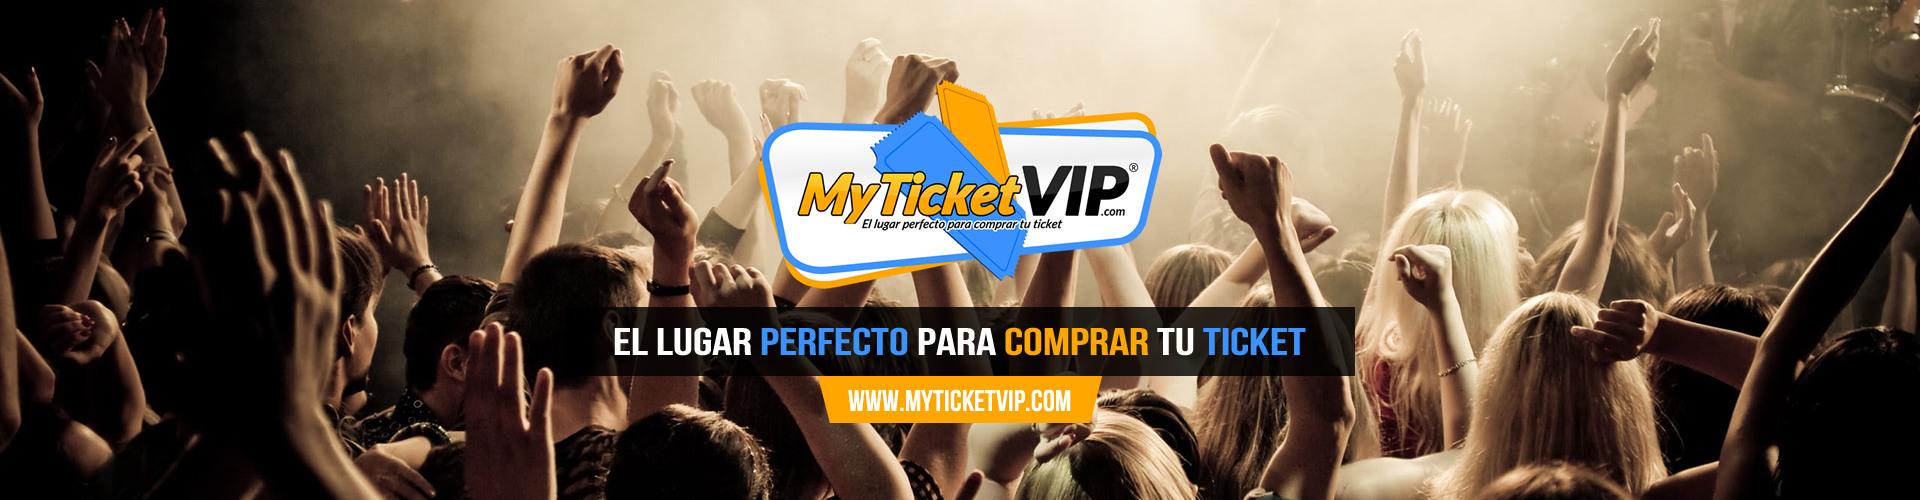 MyTicketVIP.com